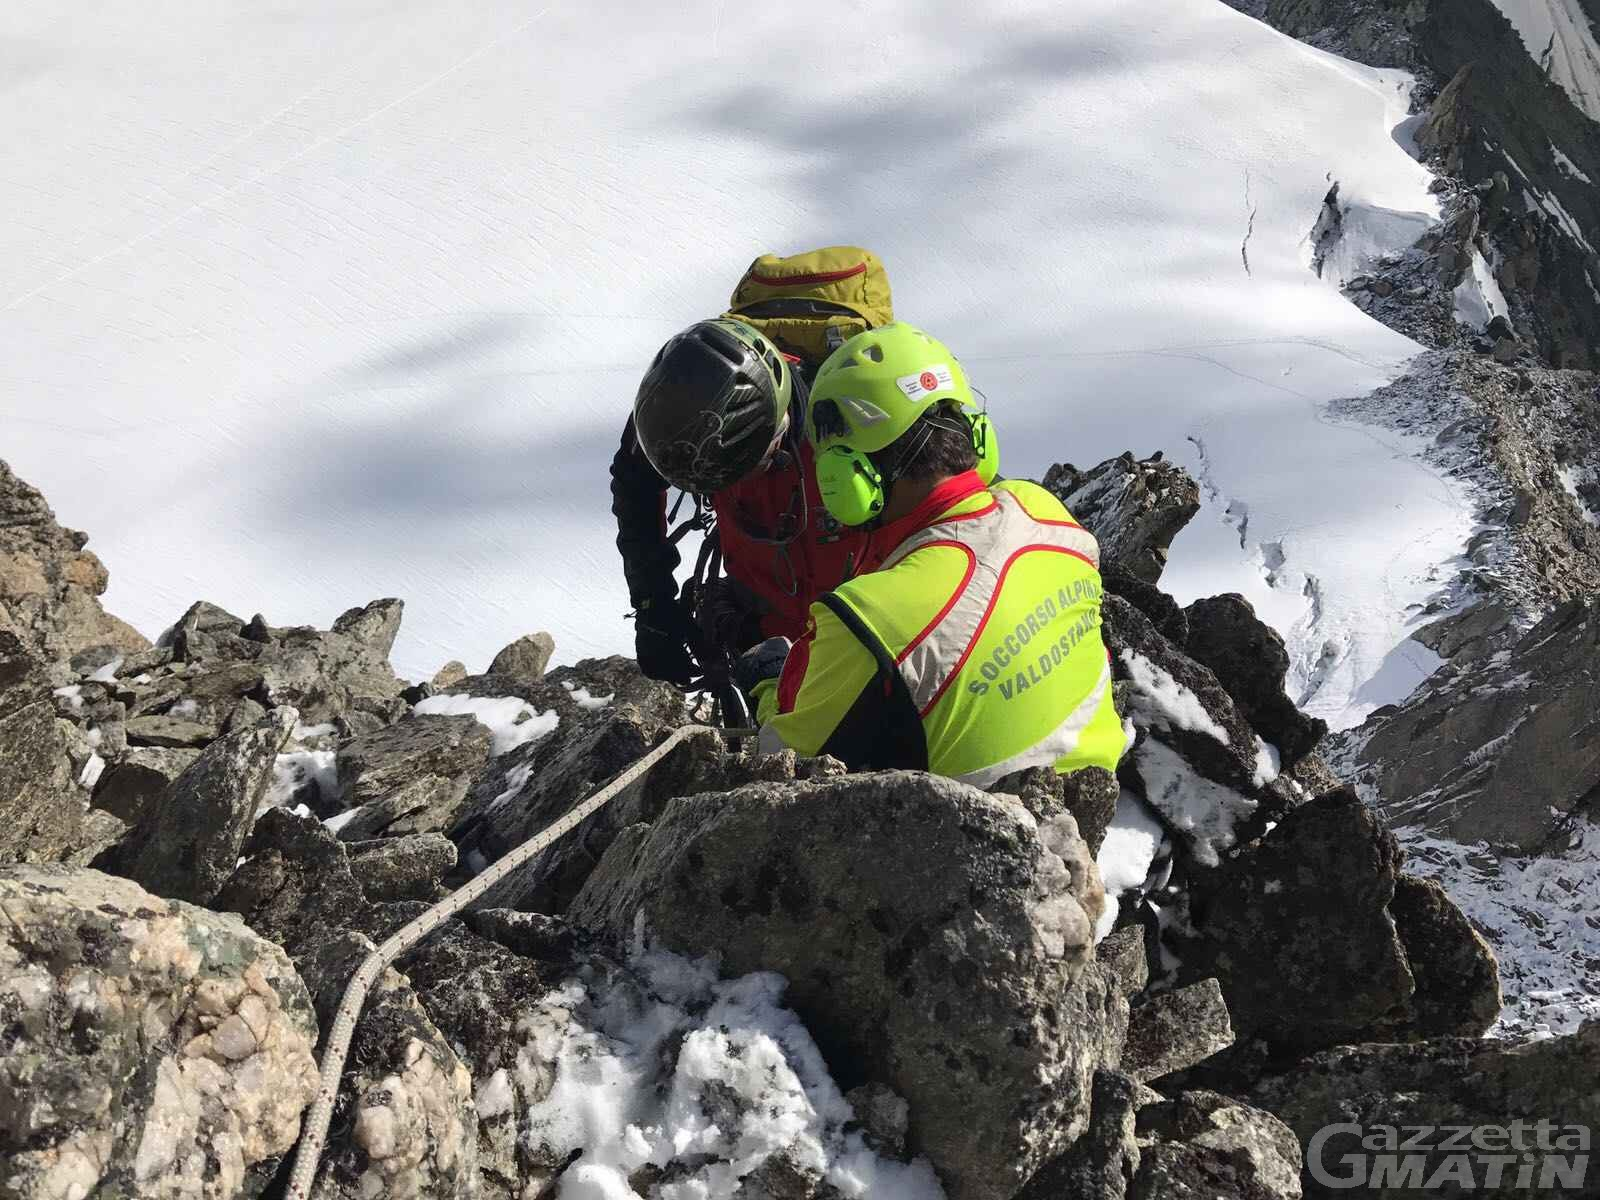 Incidenti in montagna: due feriti sull'Aiguilles de Marbrées